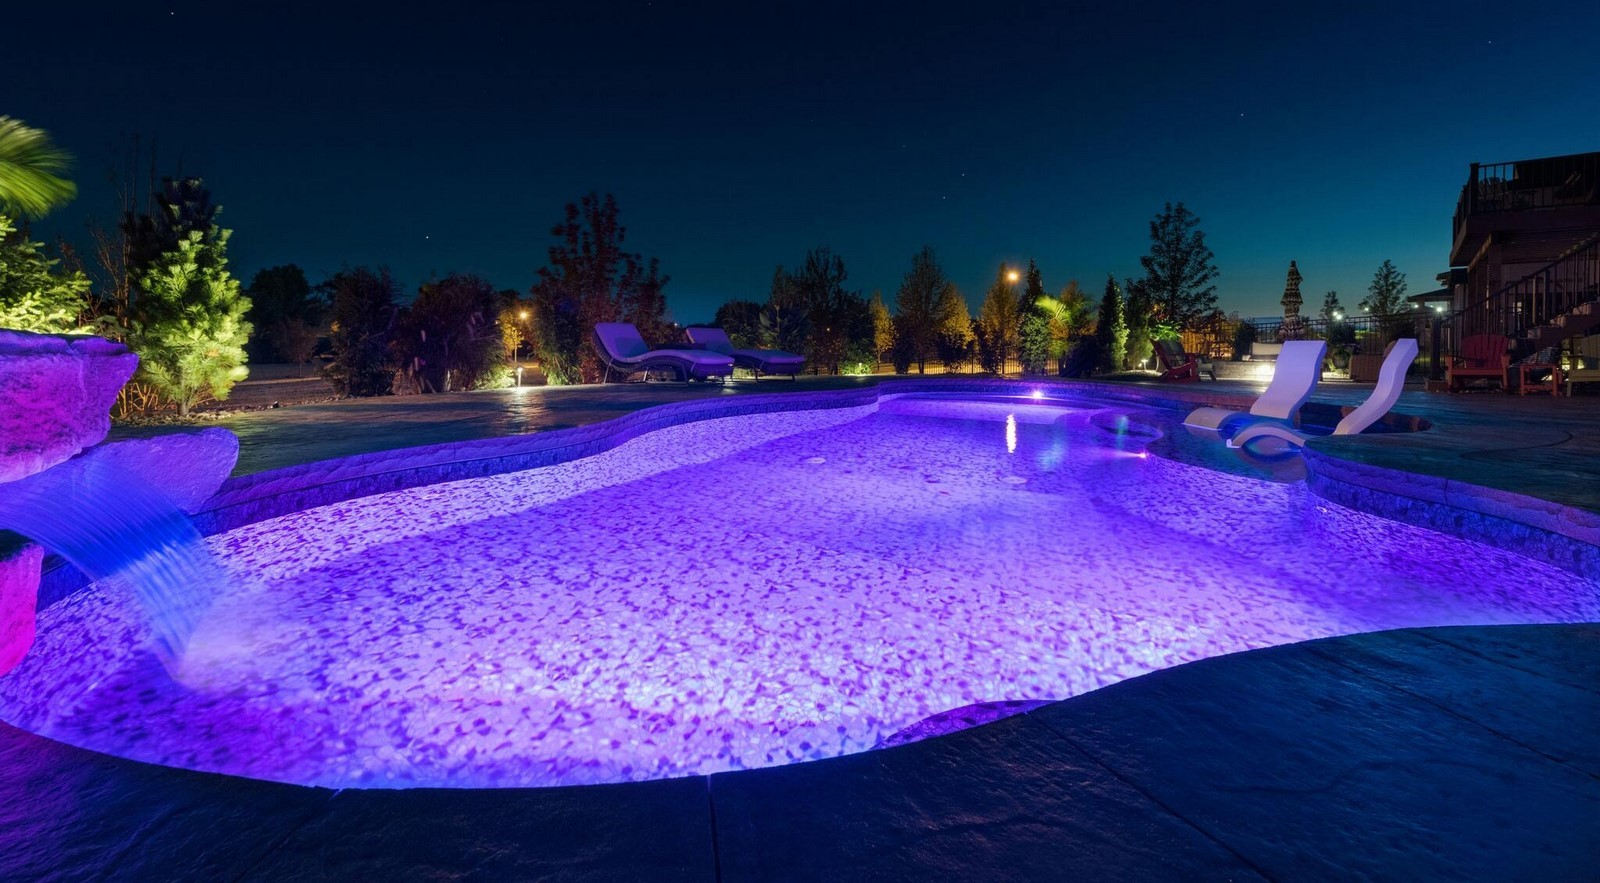 25 flooring patterns for Swimming Pools - Sheet33